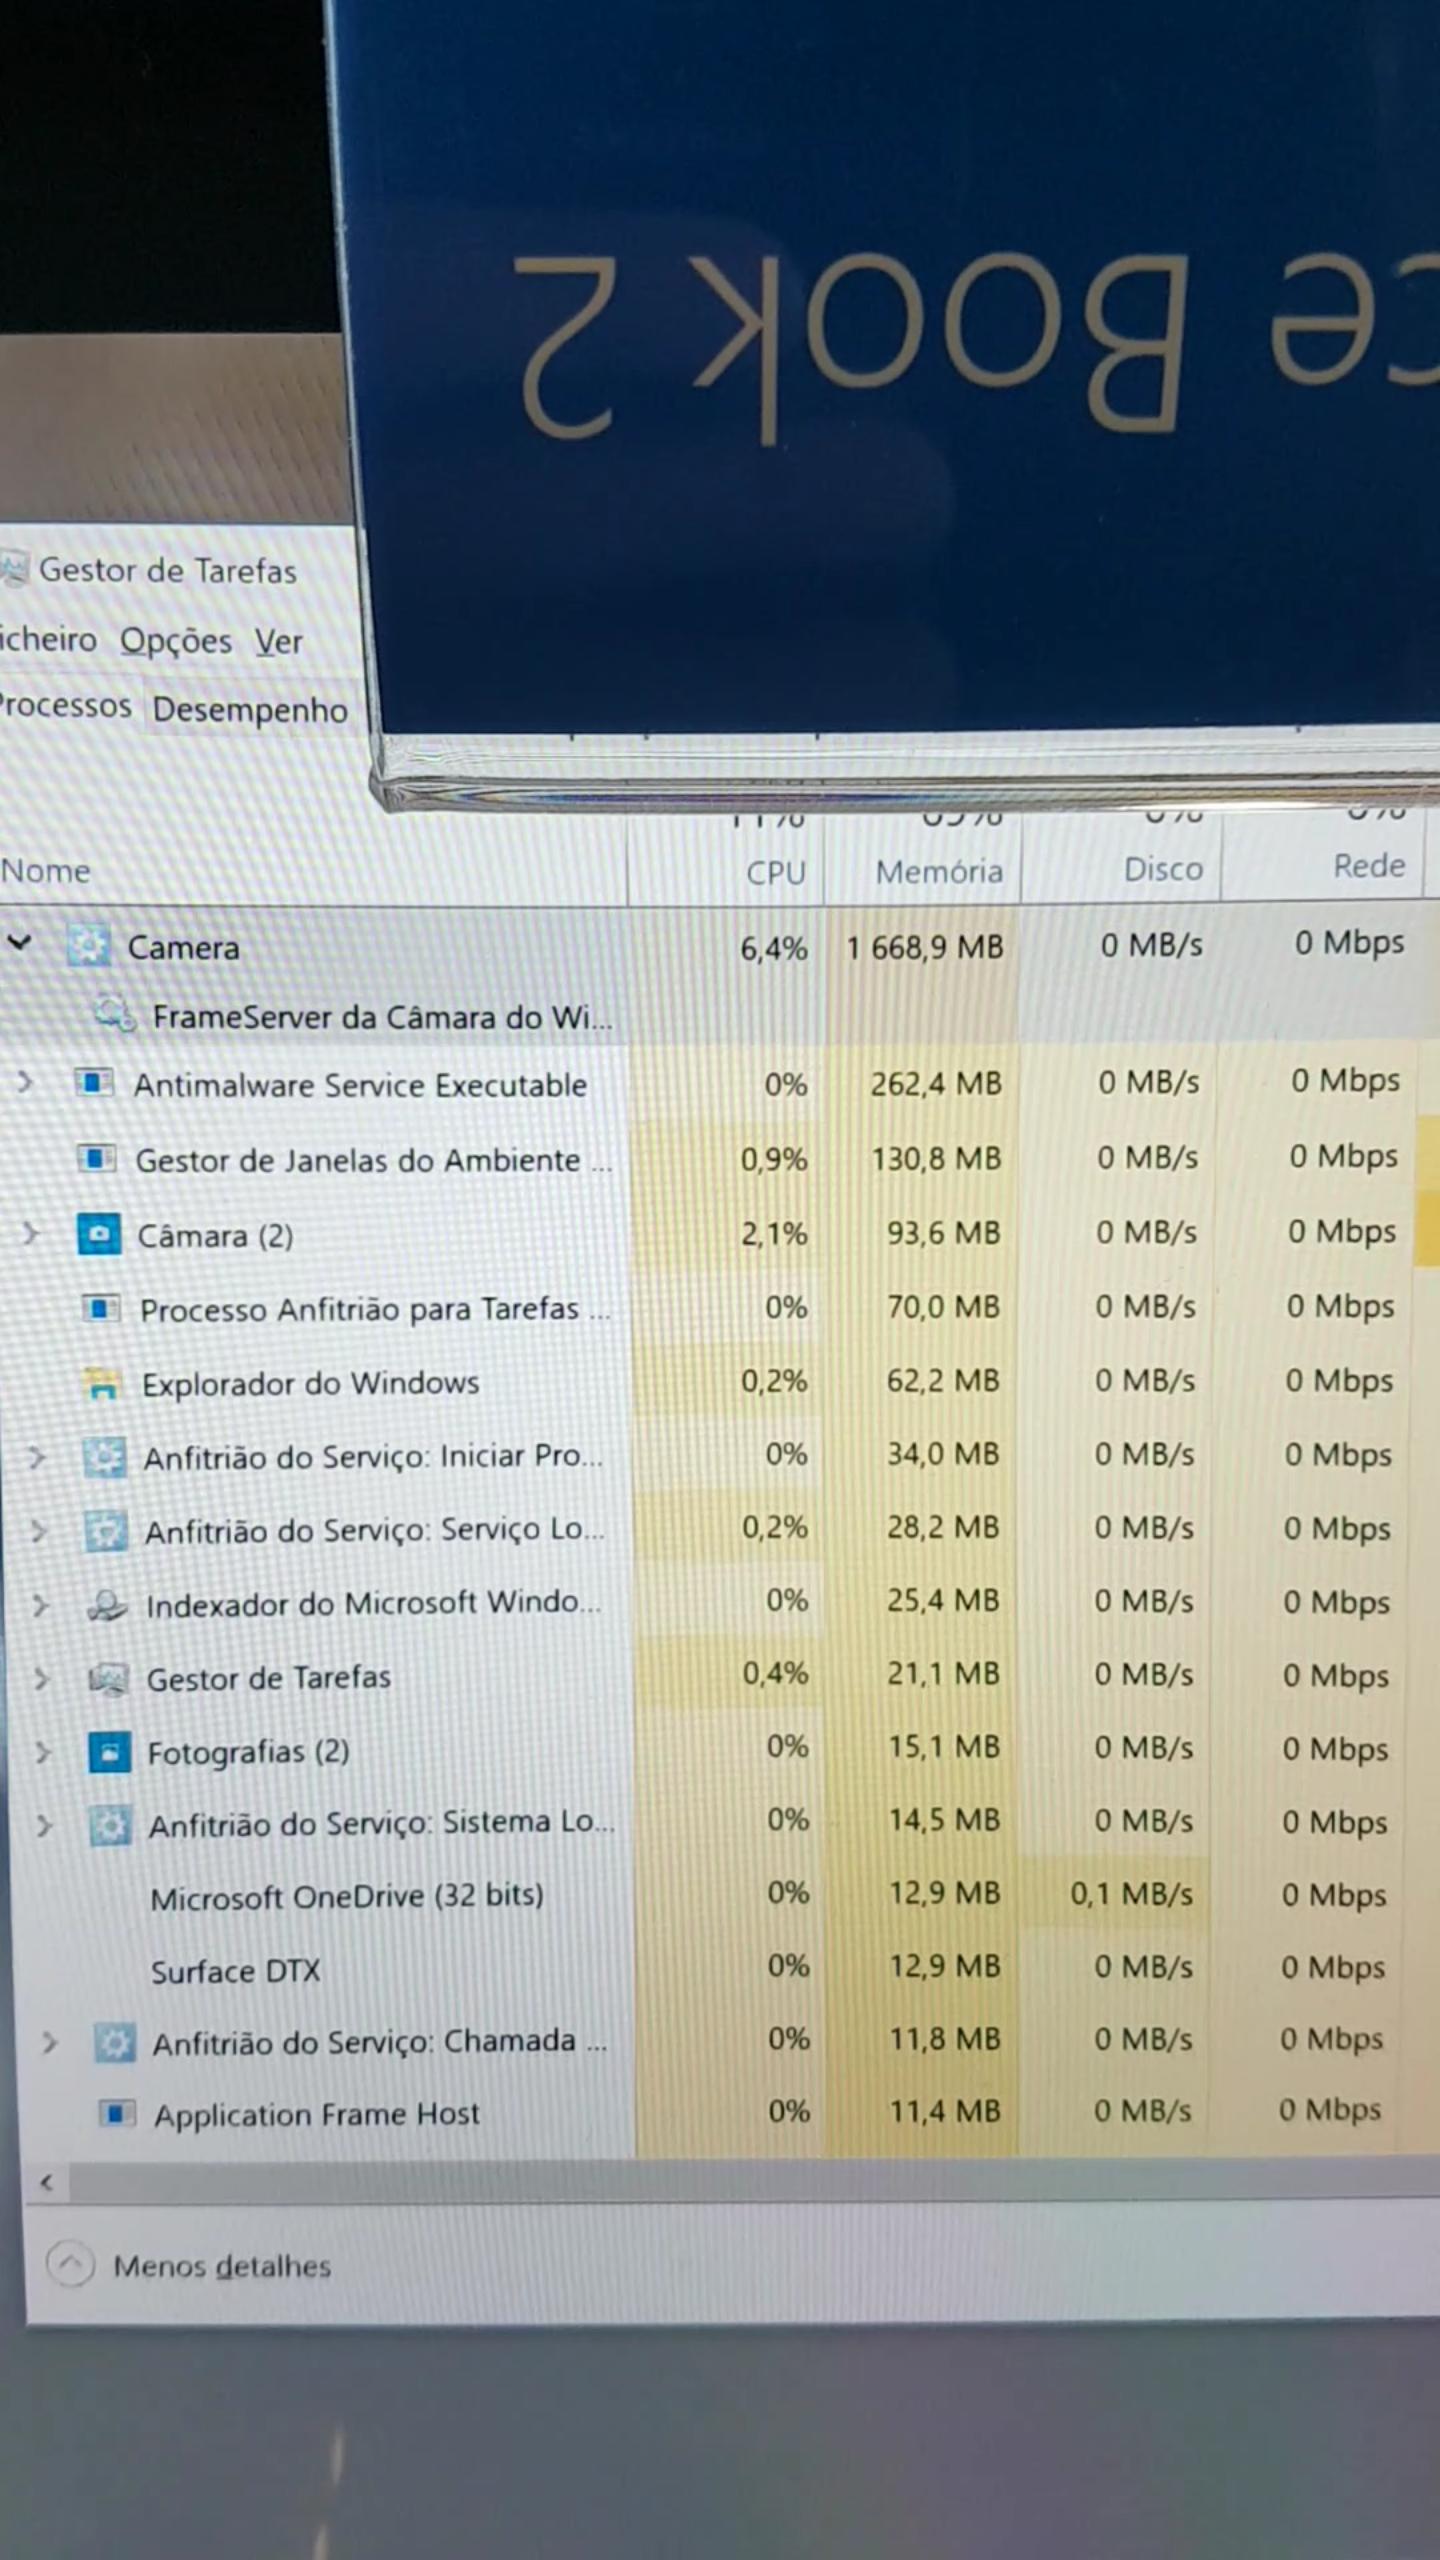 Windows Camera Frame Server - memory leak leading to freeze